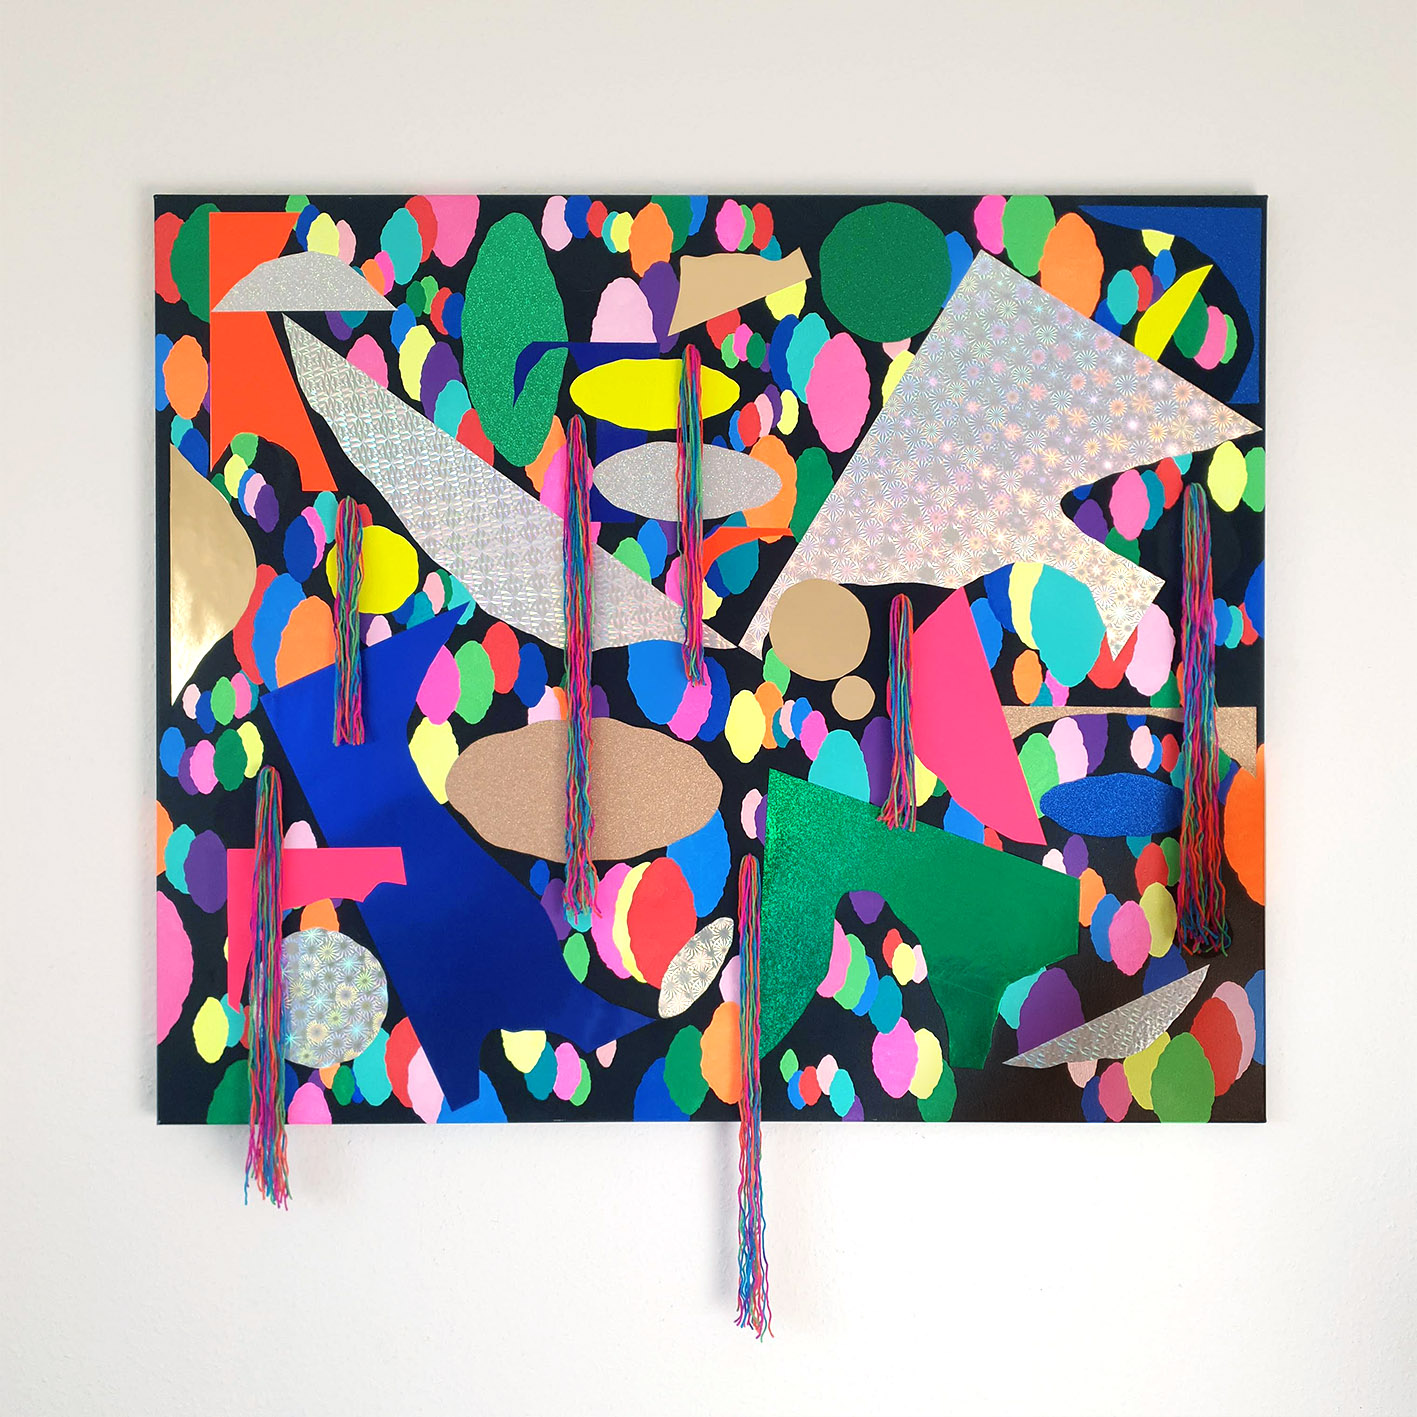 Isu Kim Berlin Kreuzberg Contemporary Art Installation Thread Painting Collage